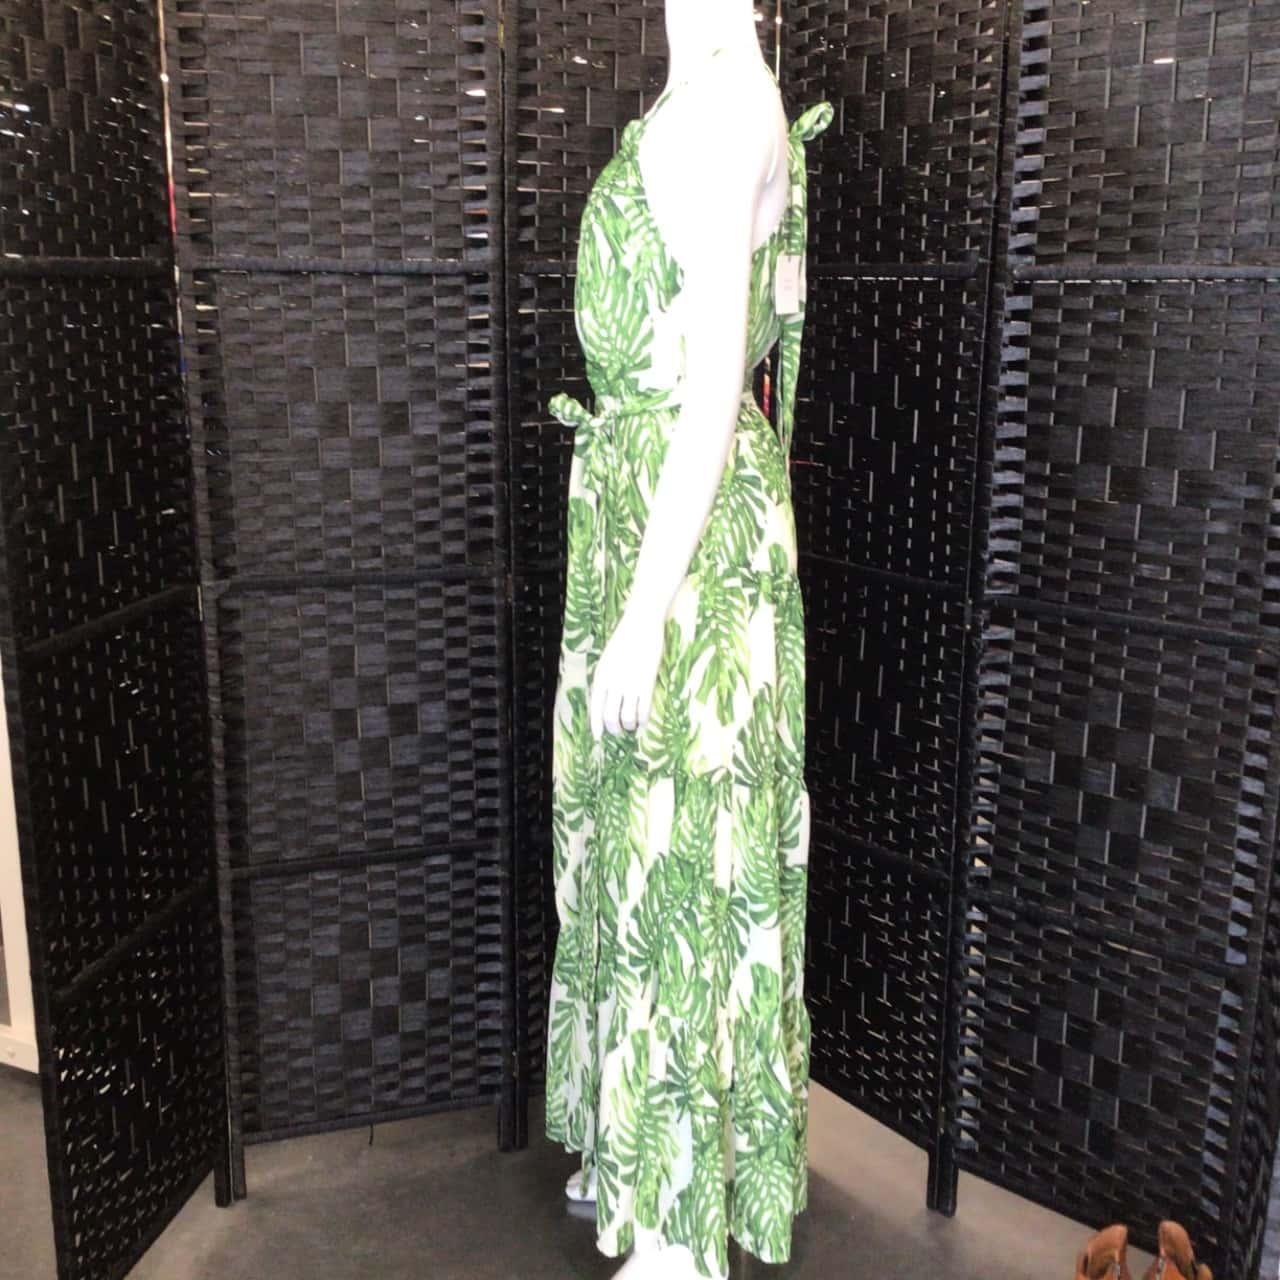 BNWT Womens  WHYTE VALENTYNE BOHO STYLE Size 6 Maxi Dress Green / Cream